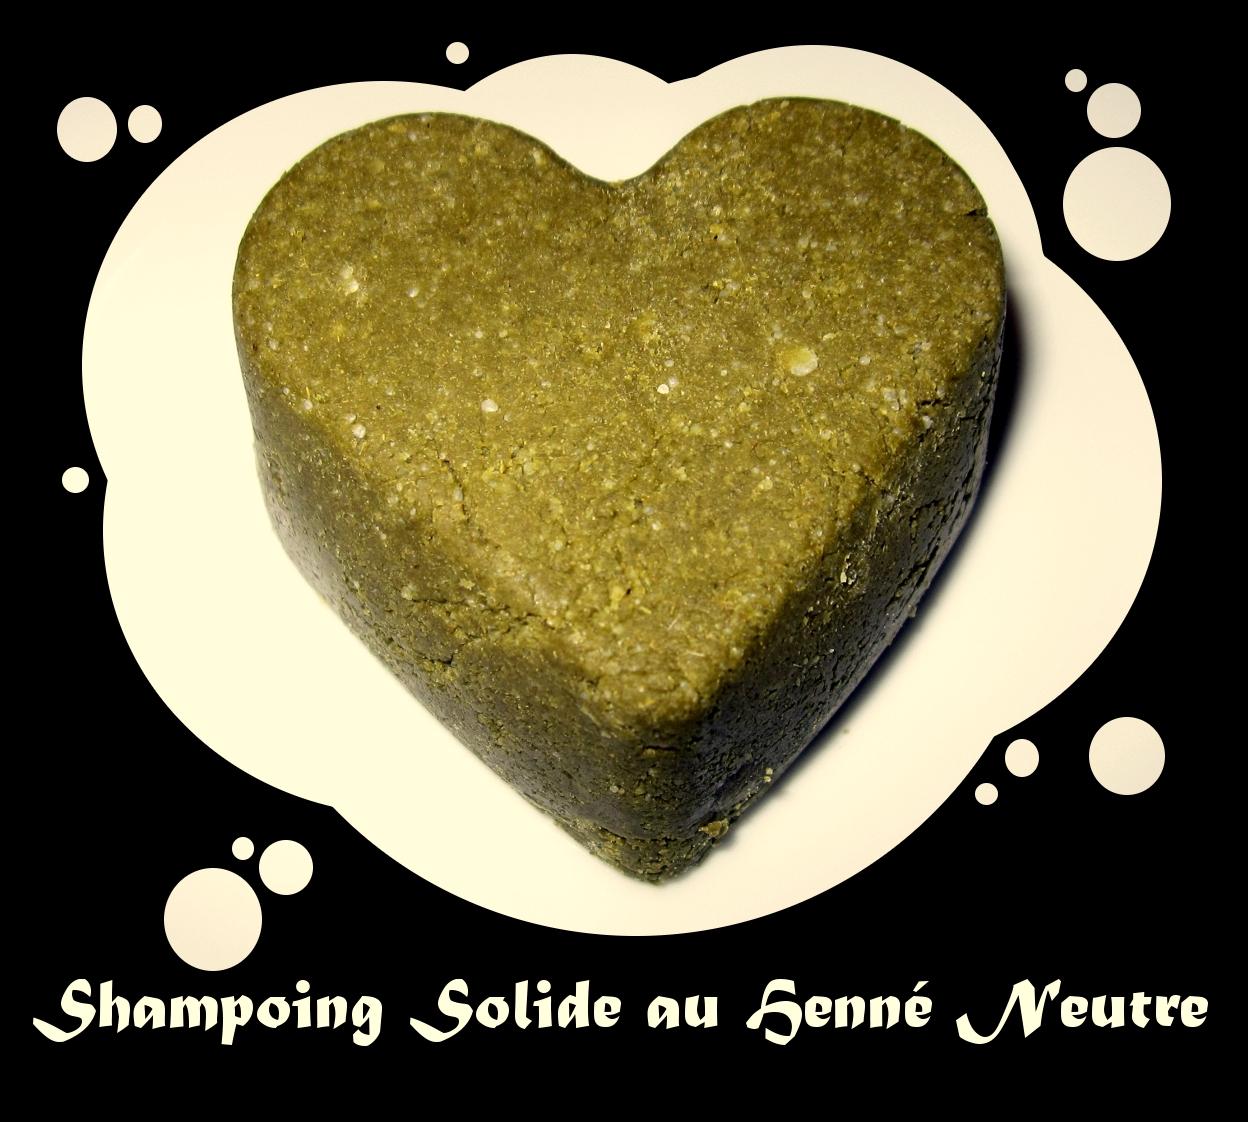 le journal capillaire d 39 amayoko shampooing solide au henn neutre. Black Bedroom Furniture Sets. Home Design Ideas